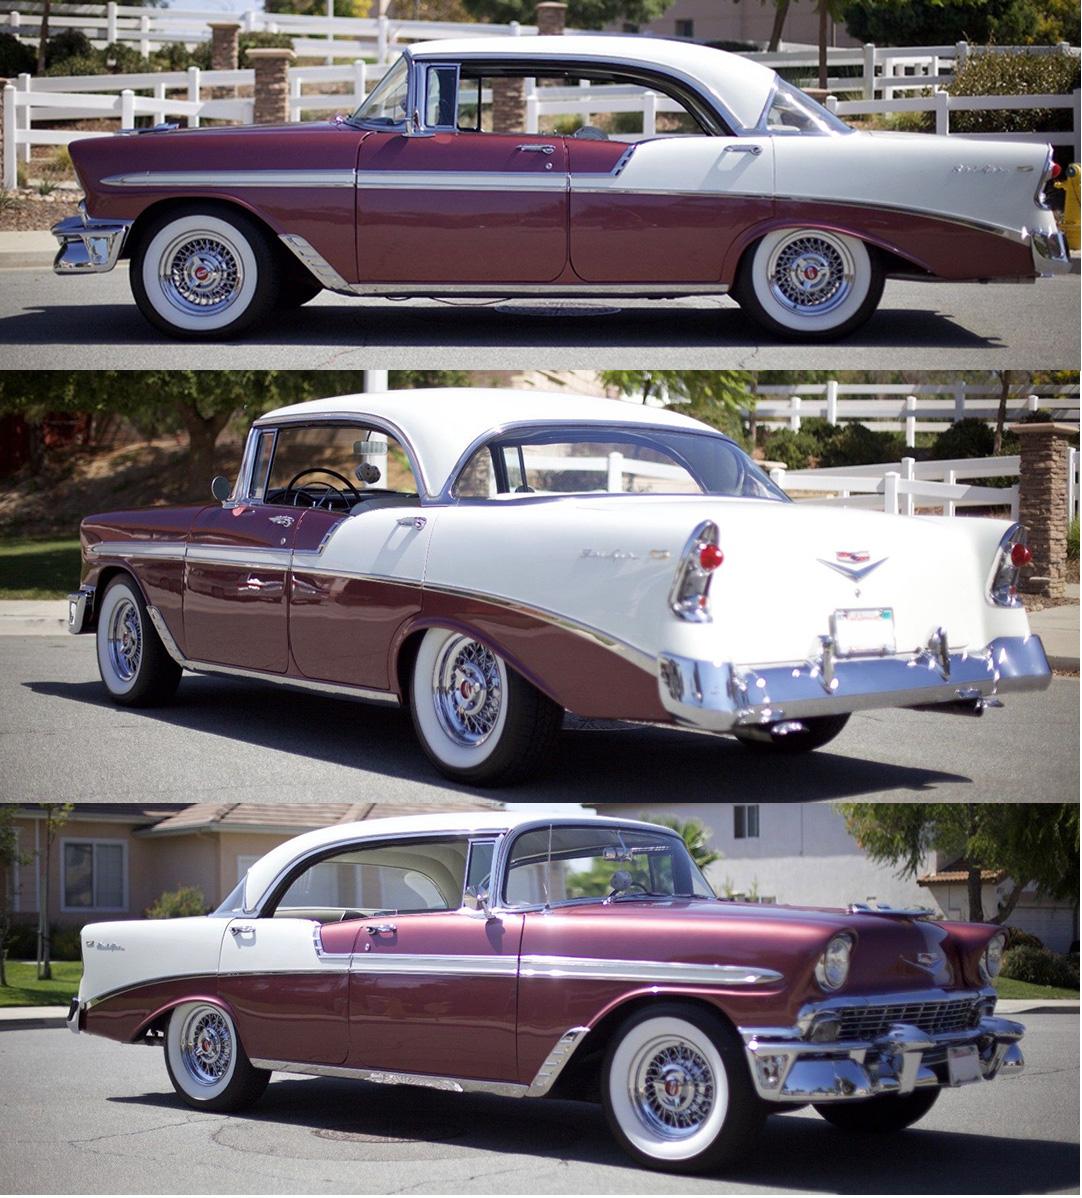 Chevrolet Customers Car Show Truespoke Wire Wheels 1957 Chevy Bel Air Convertible Lowrider Fleetline Owner Mr John Varela 56 Spoke